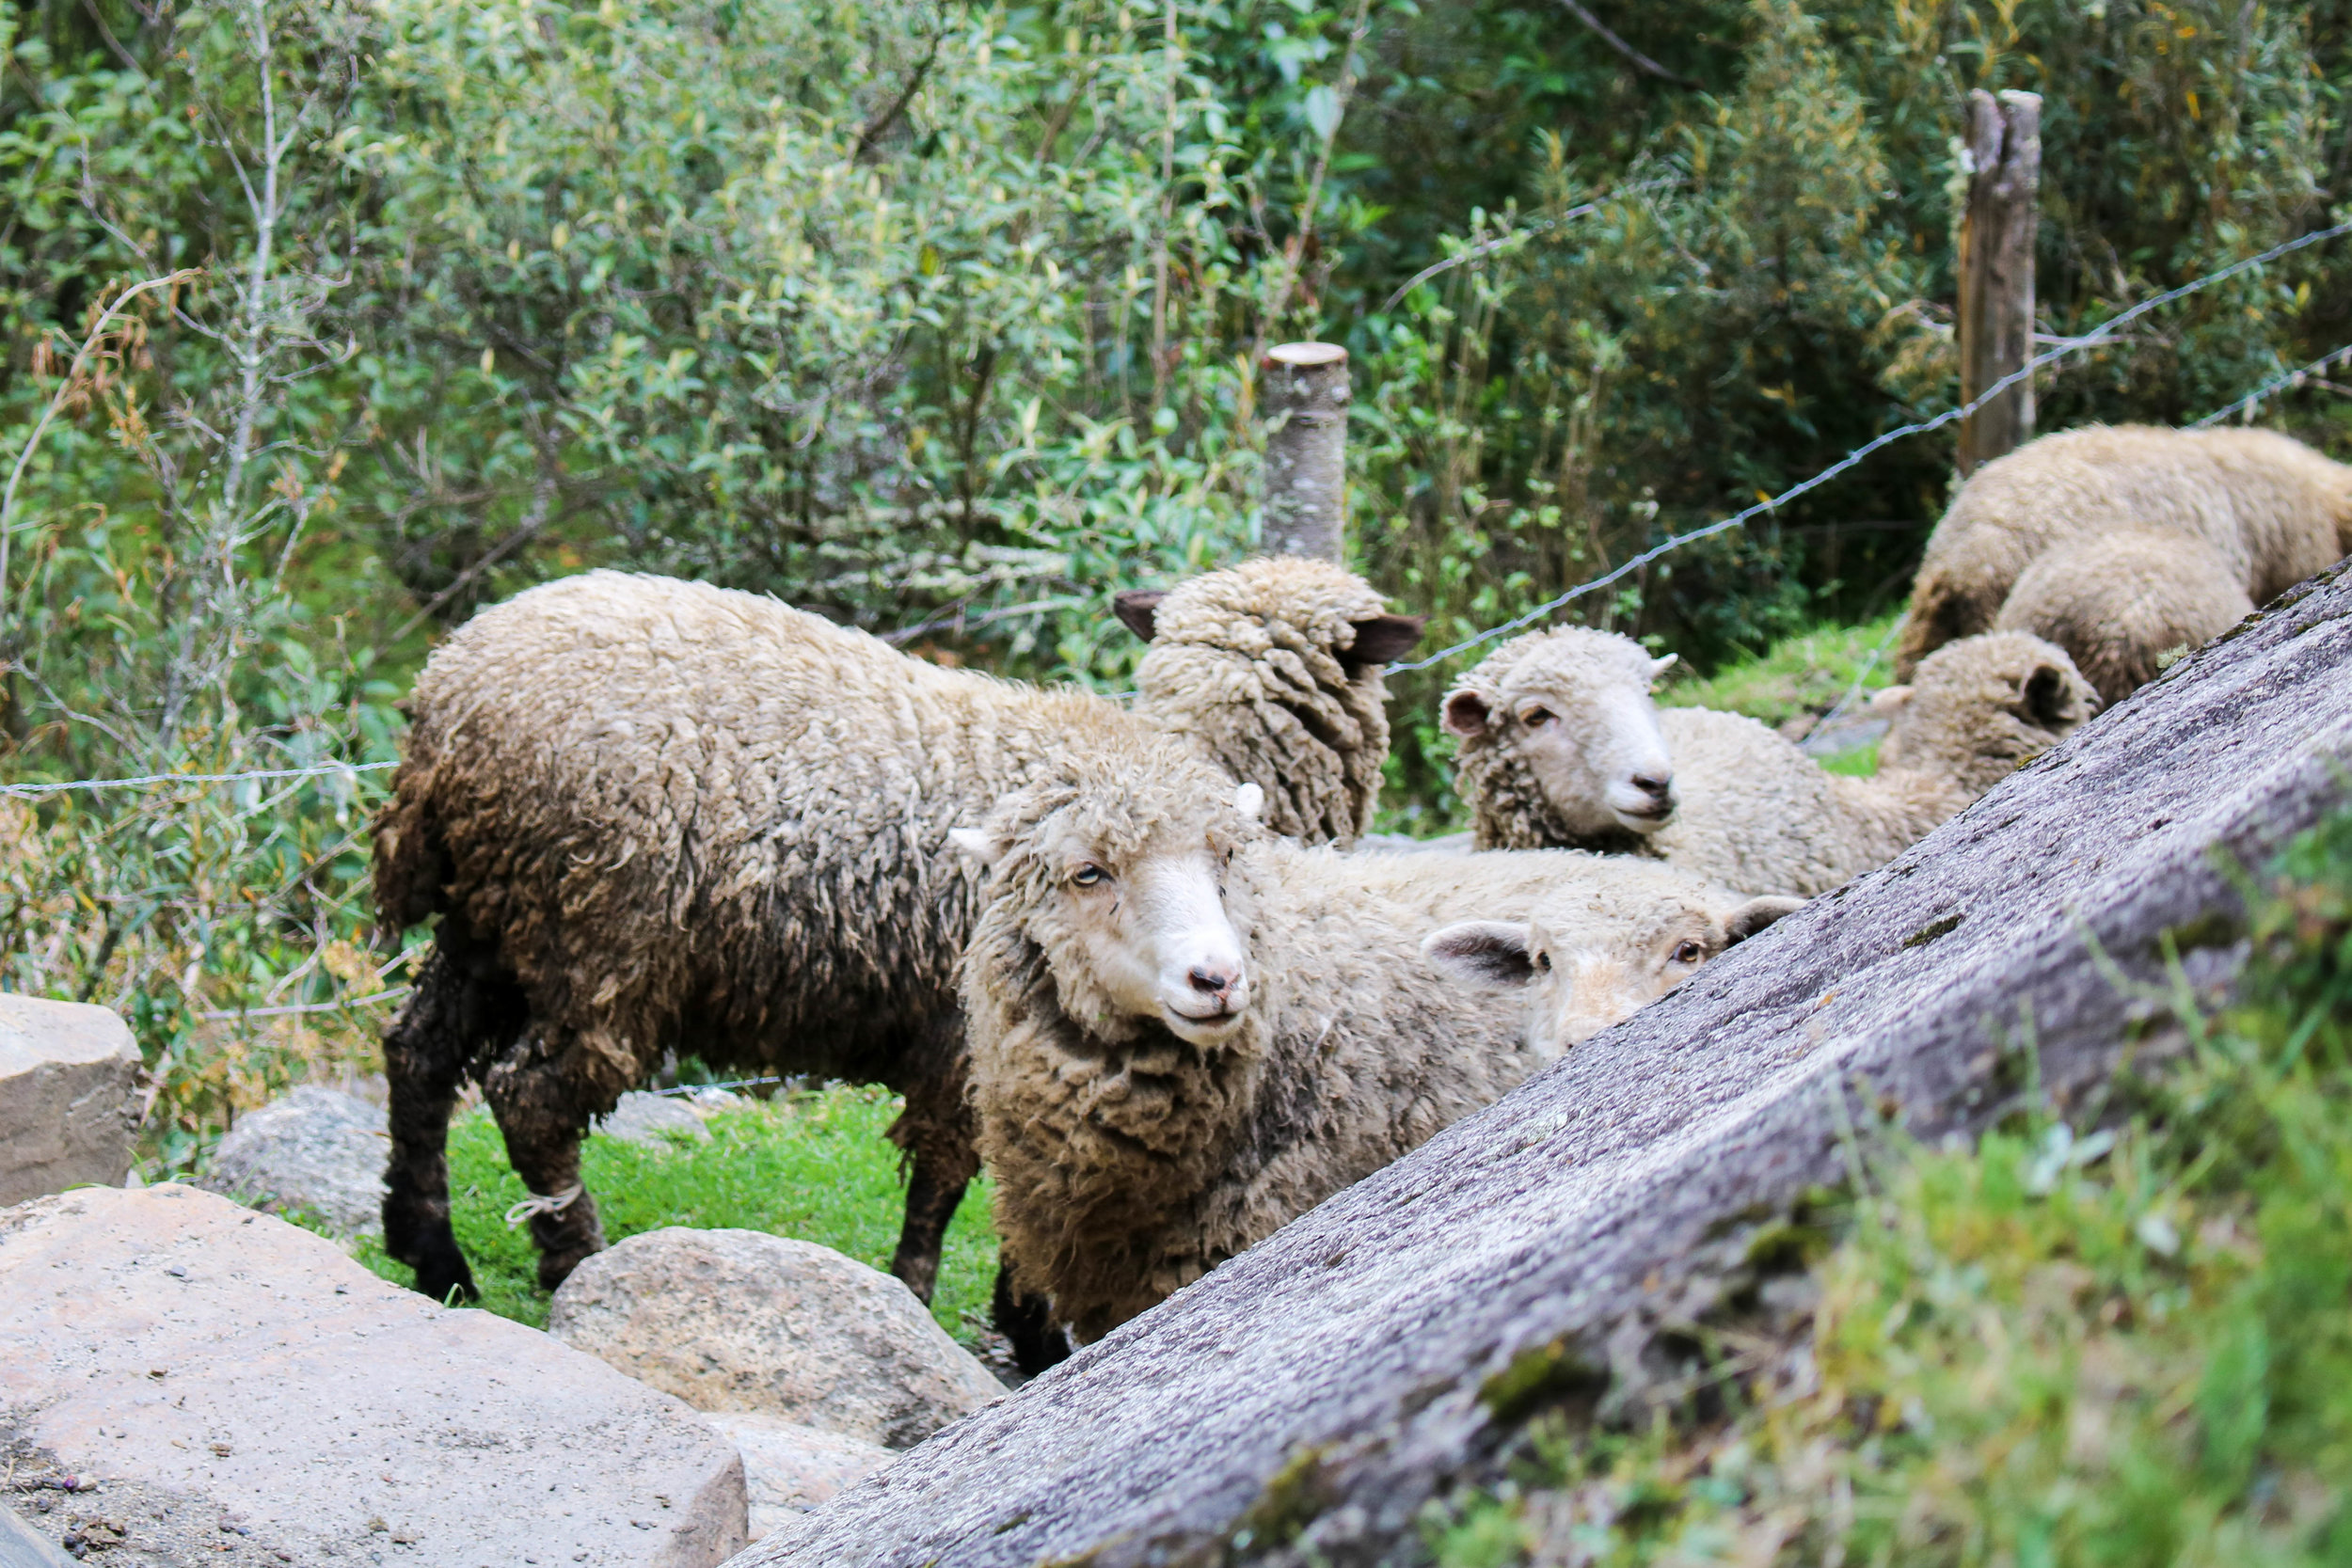 Sheep on the Trek, Peru